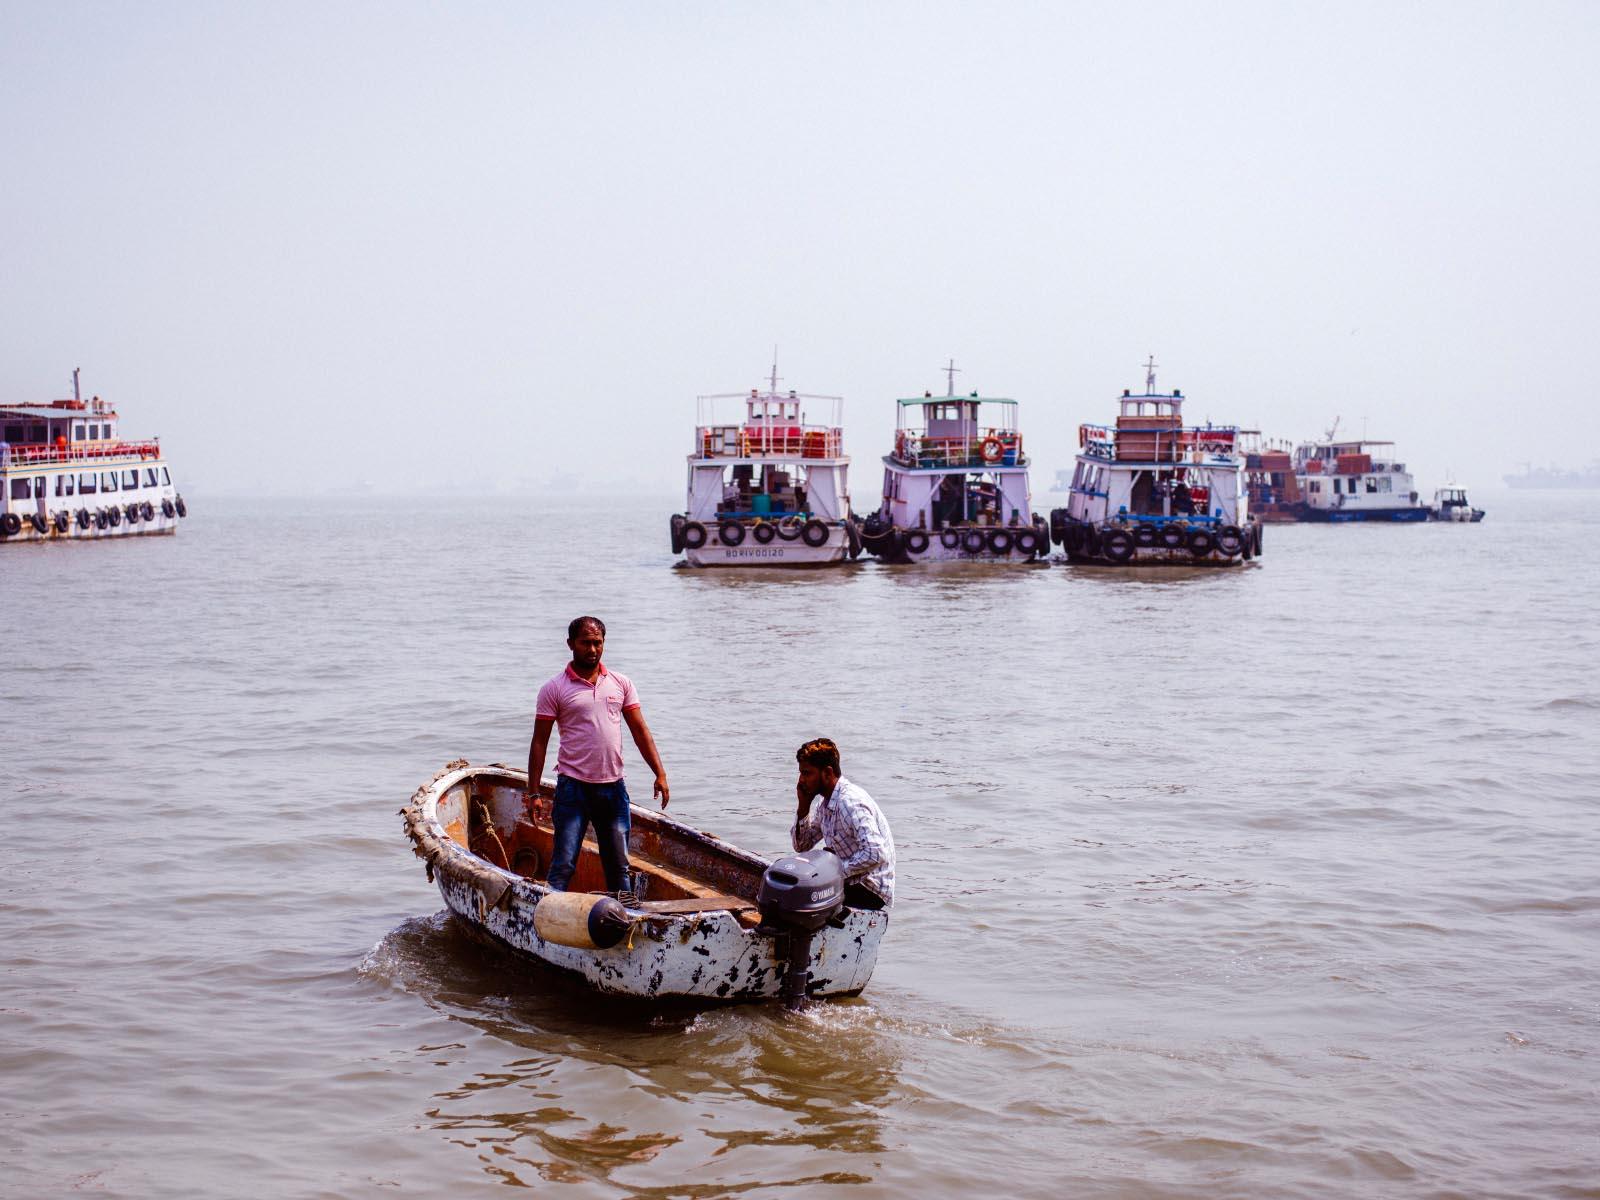 india-travel-photography-08.jpg